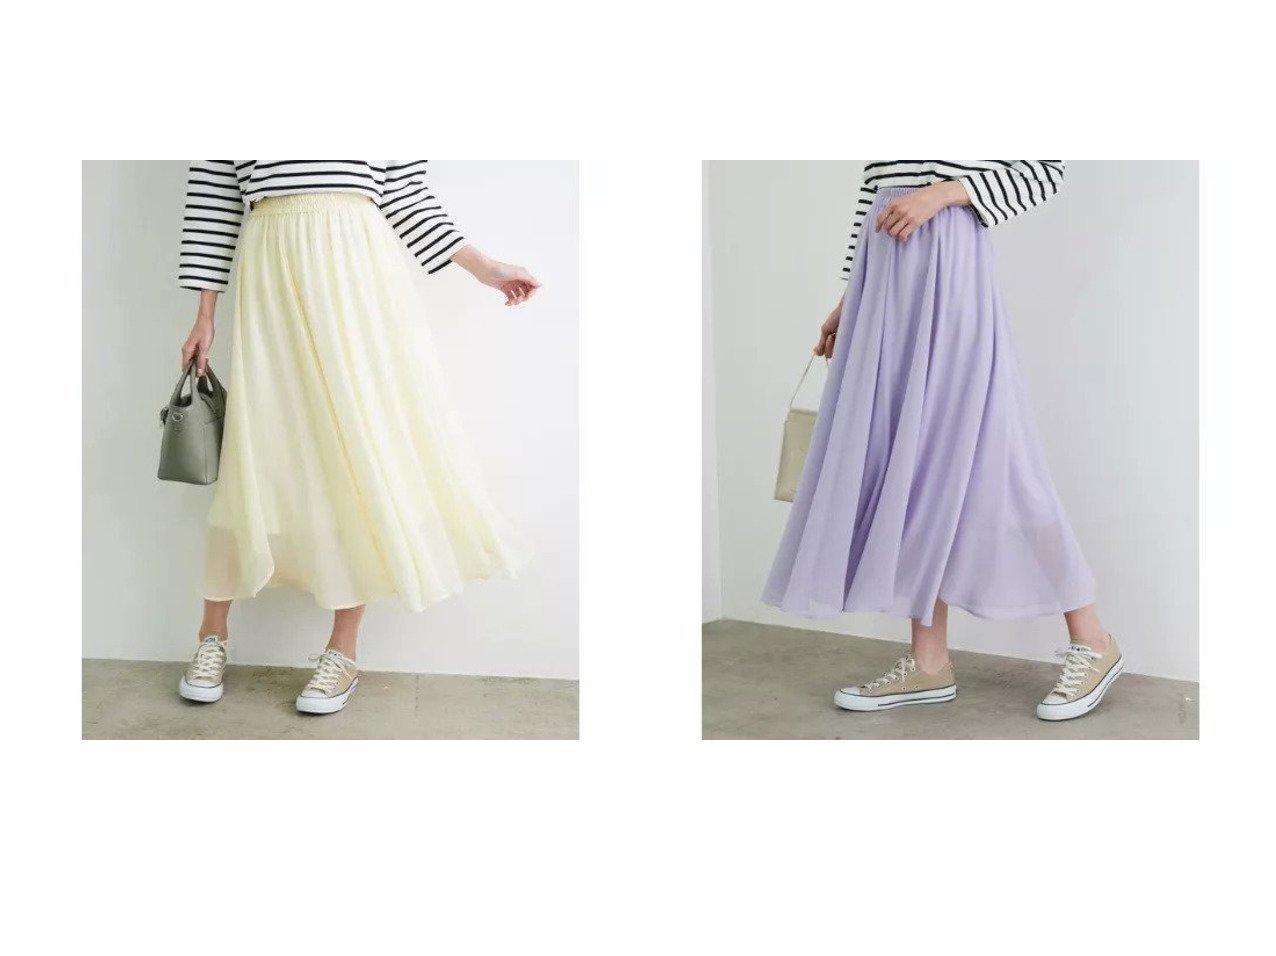 【ROPE' PICNIC/ロペピクニック】のシアーヘムスカート 【スカート】おすすめ!人気、トレンド・レディースファッションの通販   おすすめで人気の流行・トレンド、ファッションの通販商品 メンズファッション・キッズファッション・インテリア・家具・レディースファッション・服の通販 founy(ファニー) https://founy.com/ ファッション Fashion レディースファッション WOMEN スカート Skirt スカラップ ポケット 春 Spring |ID:crp329100000026868